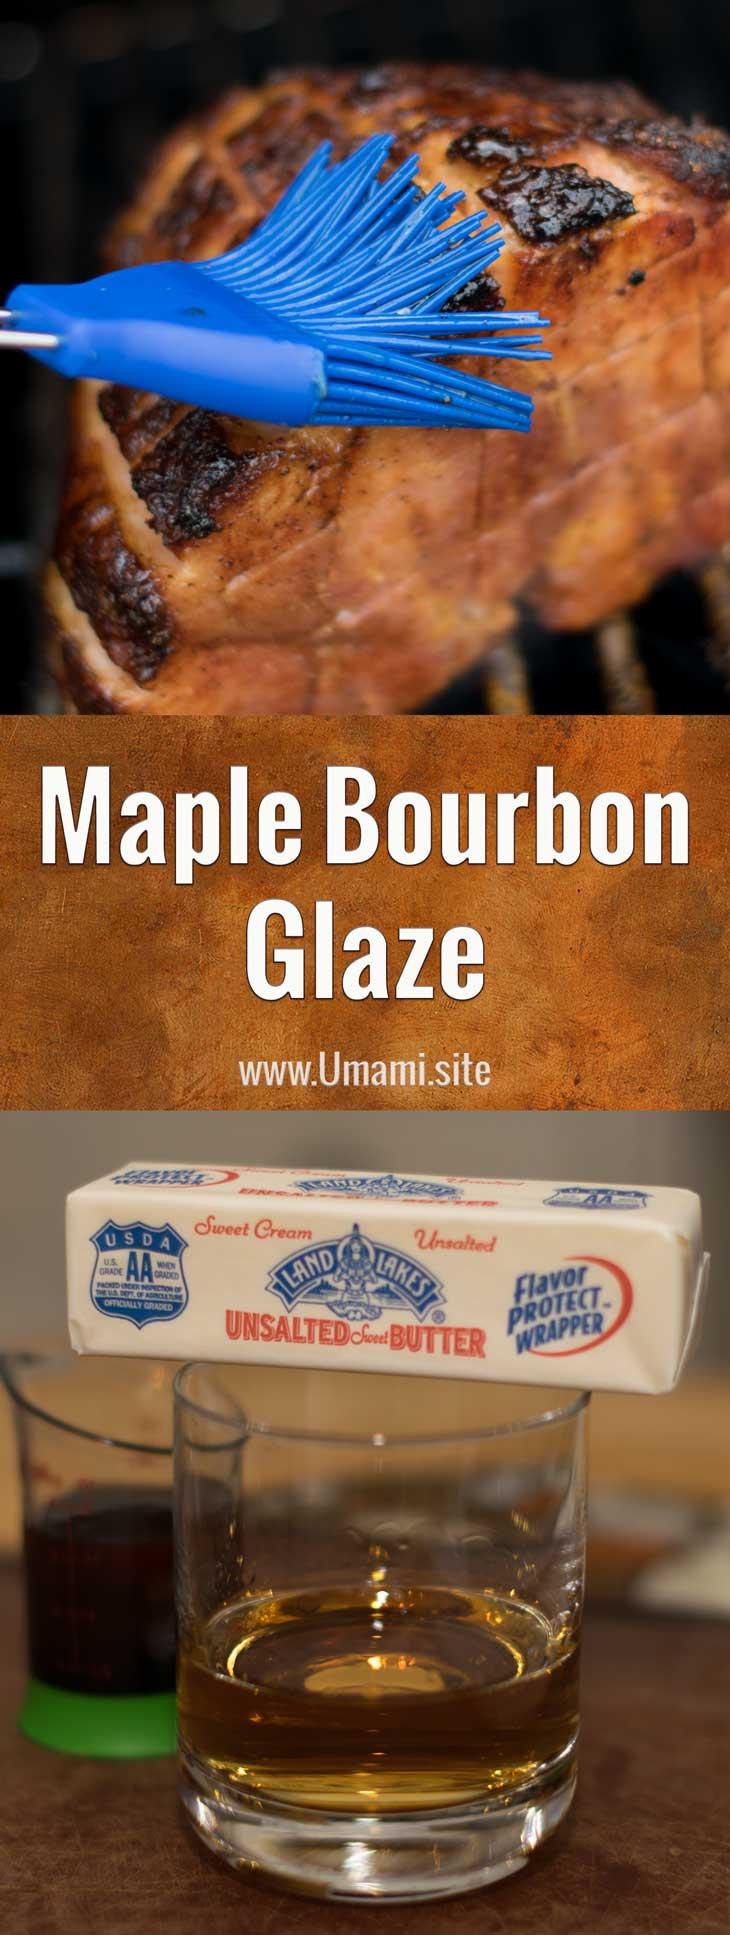 Maple Bourbon Glaze Pinterest